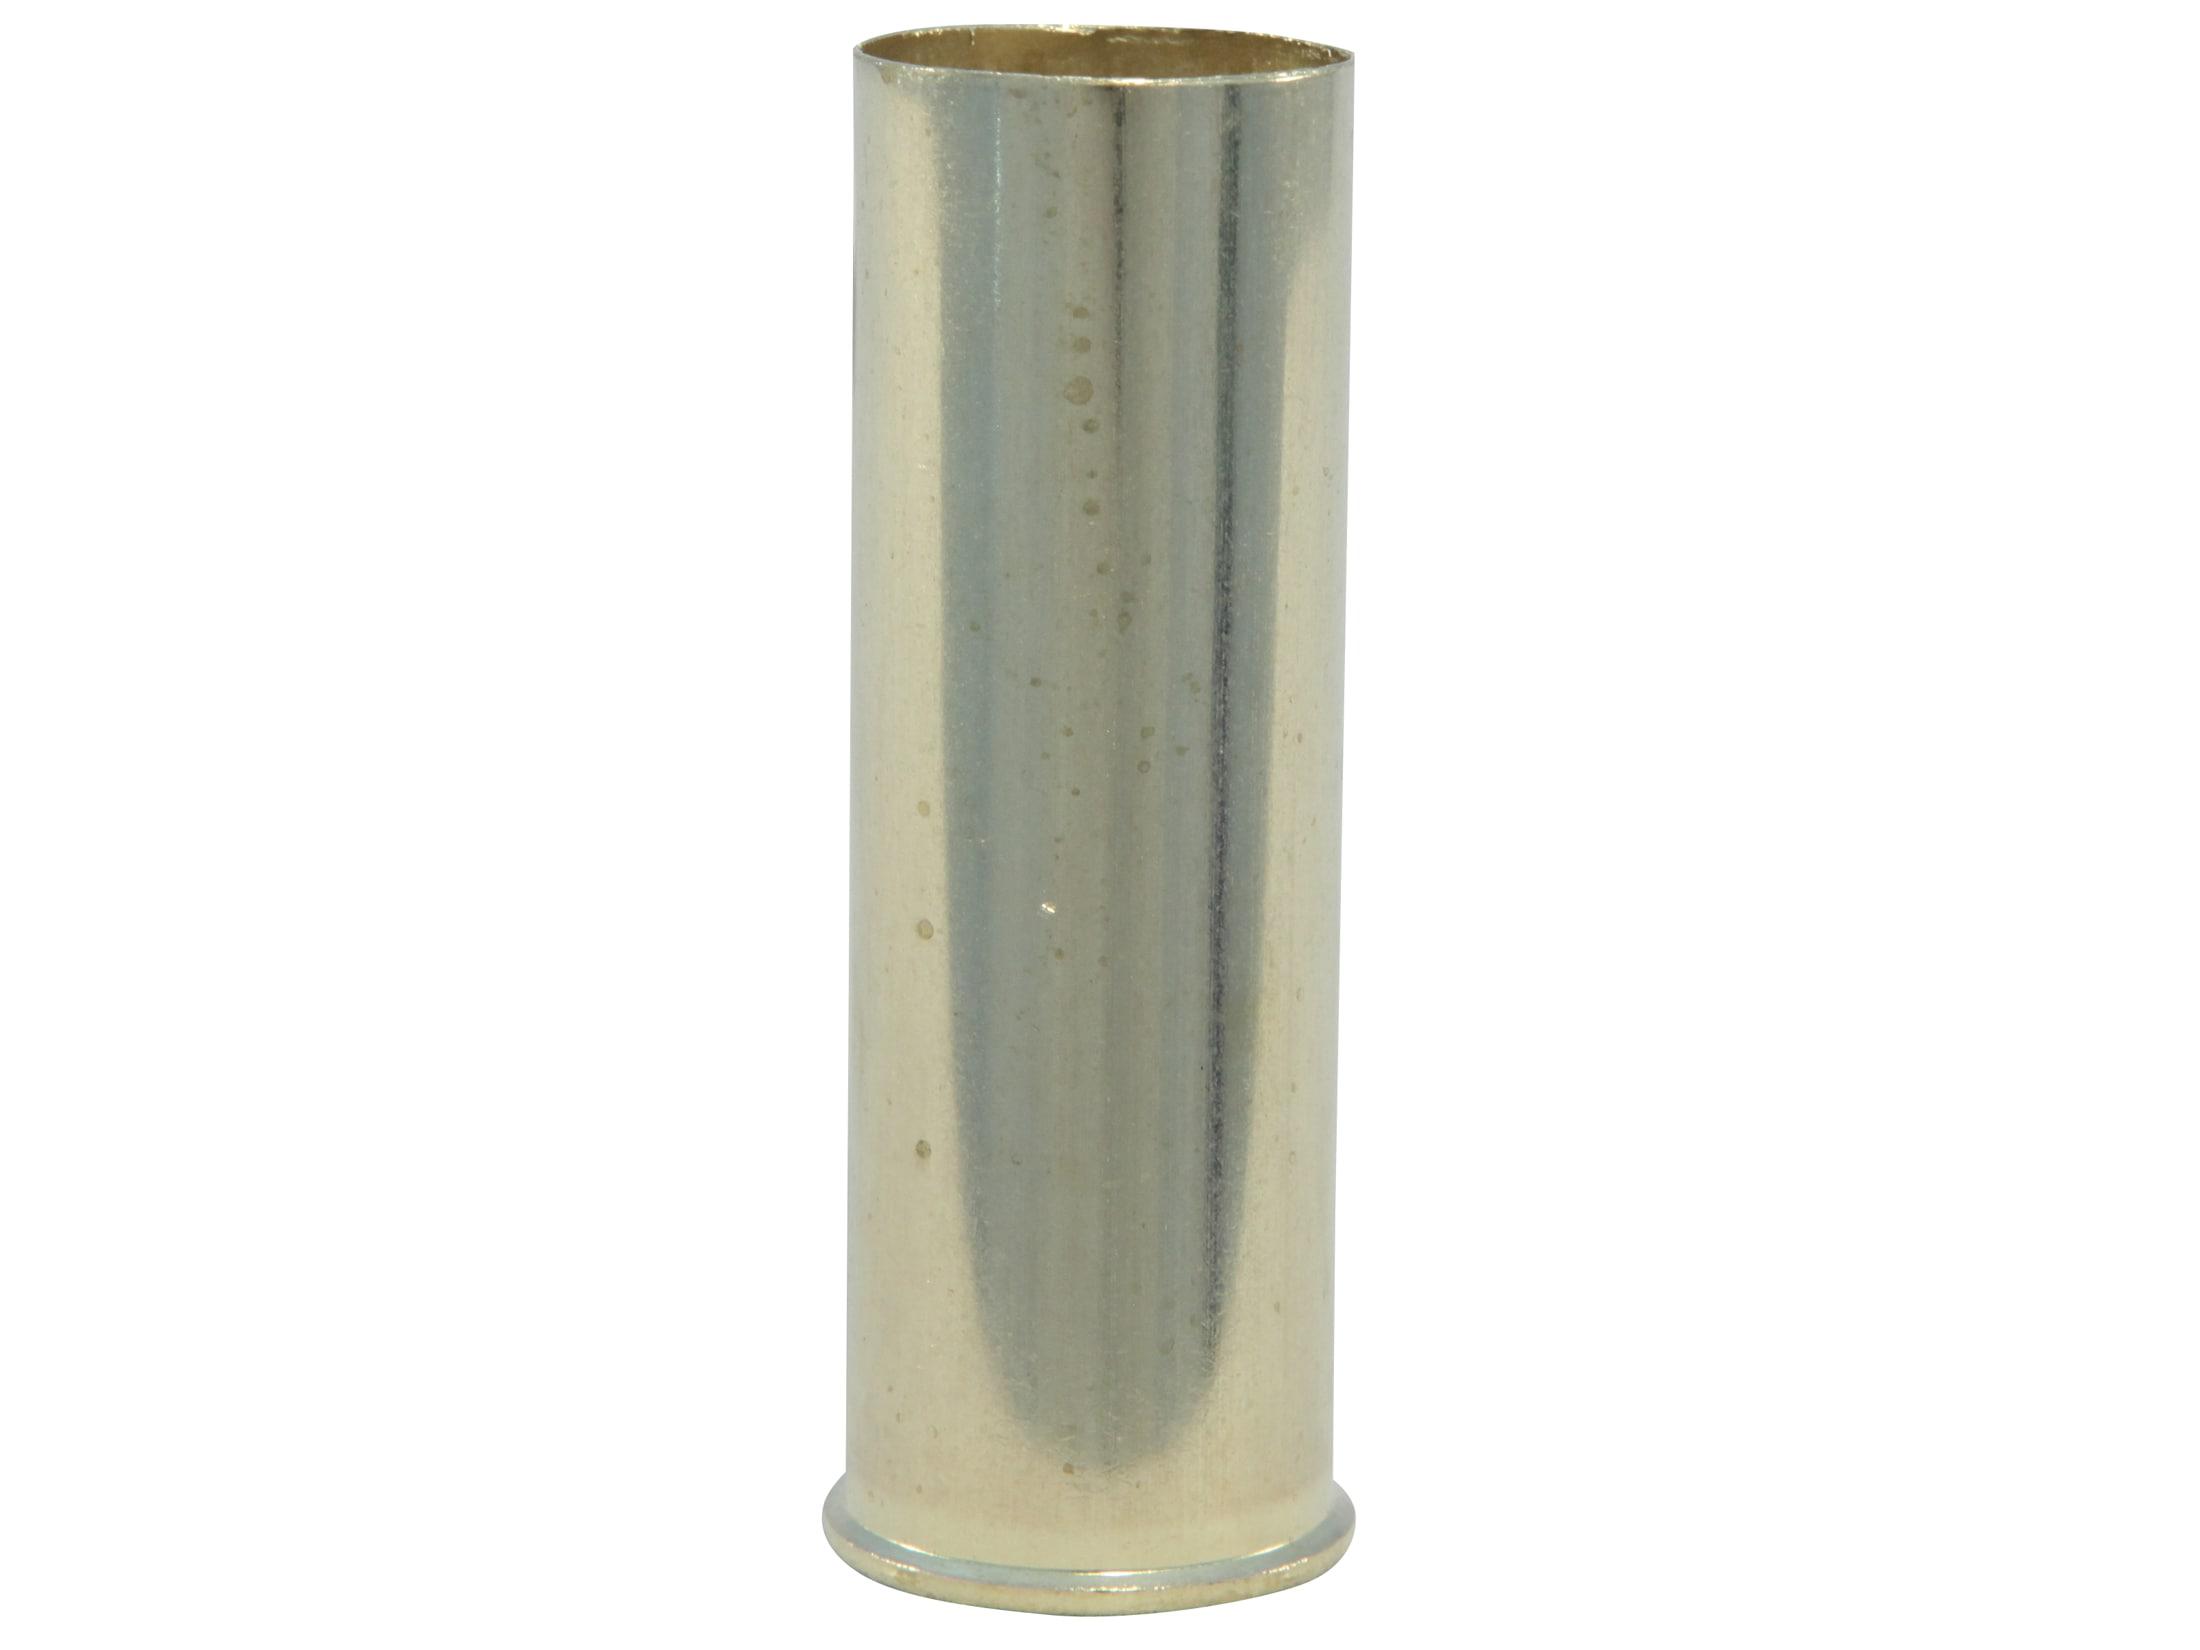 Magtech Shotshell Hulls 12 Ga 2-1/2 Brass Case of 250 (10 Boxes of 25)